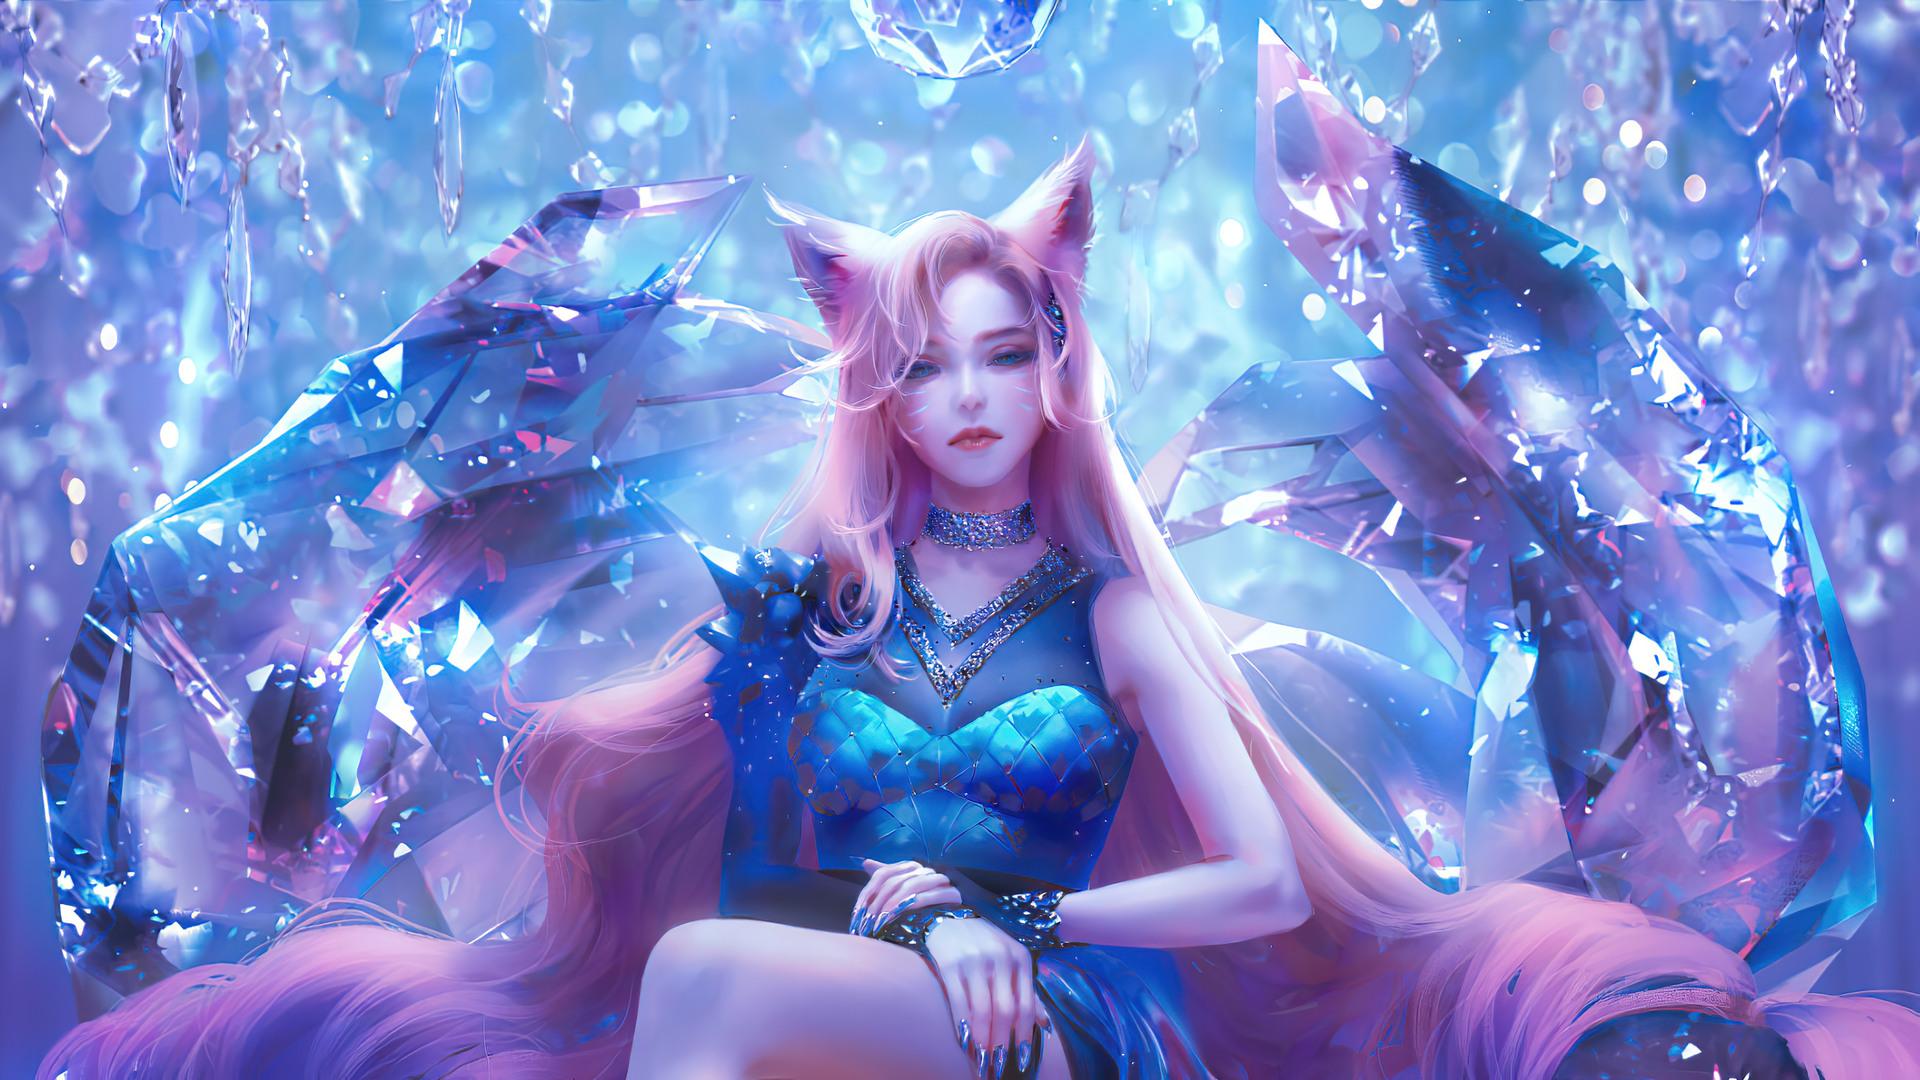 General 1920x1080 League of Legends Ahri Ahri (League of Legends) fox ears crystal  frontal view anime girls cat ears cat girl women